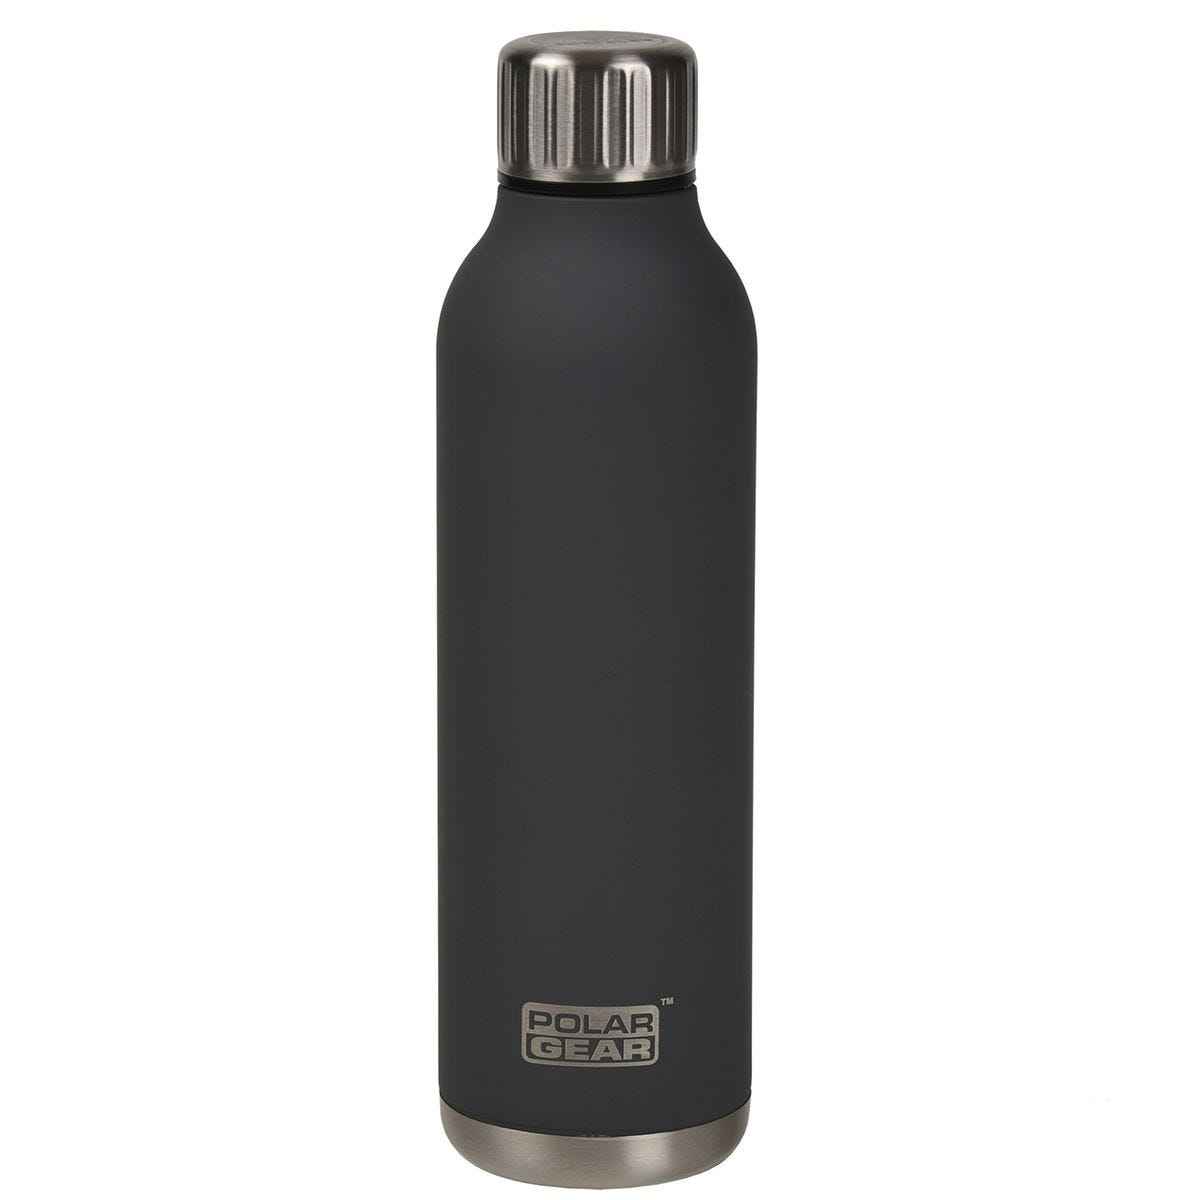 Polar Gear Orion Stainless Steel Bottle - 550ml